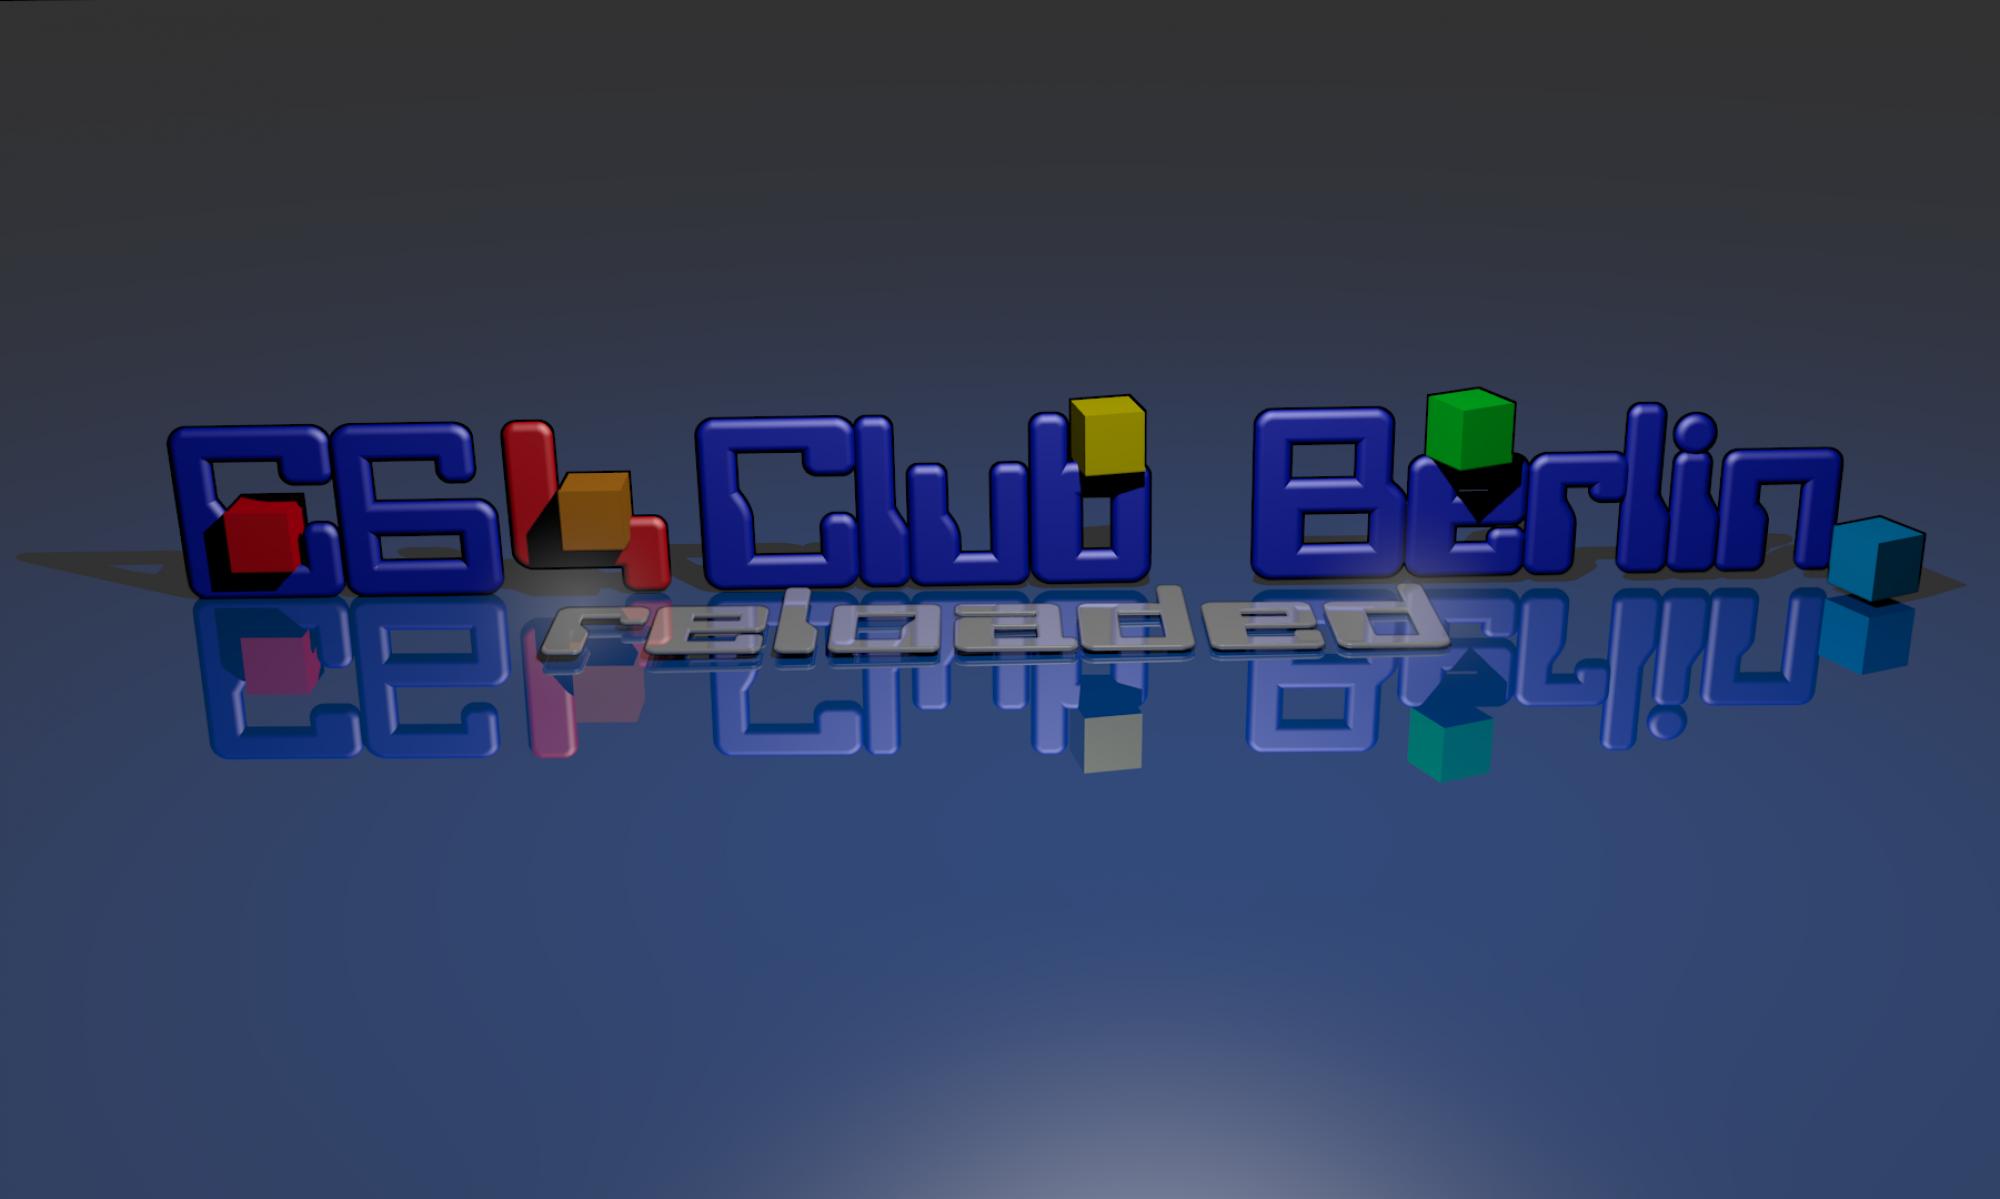 C64 Club Berlin